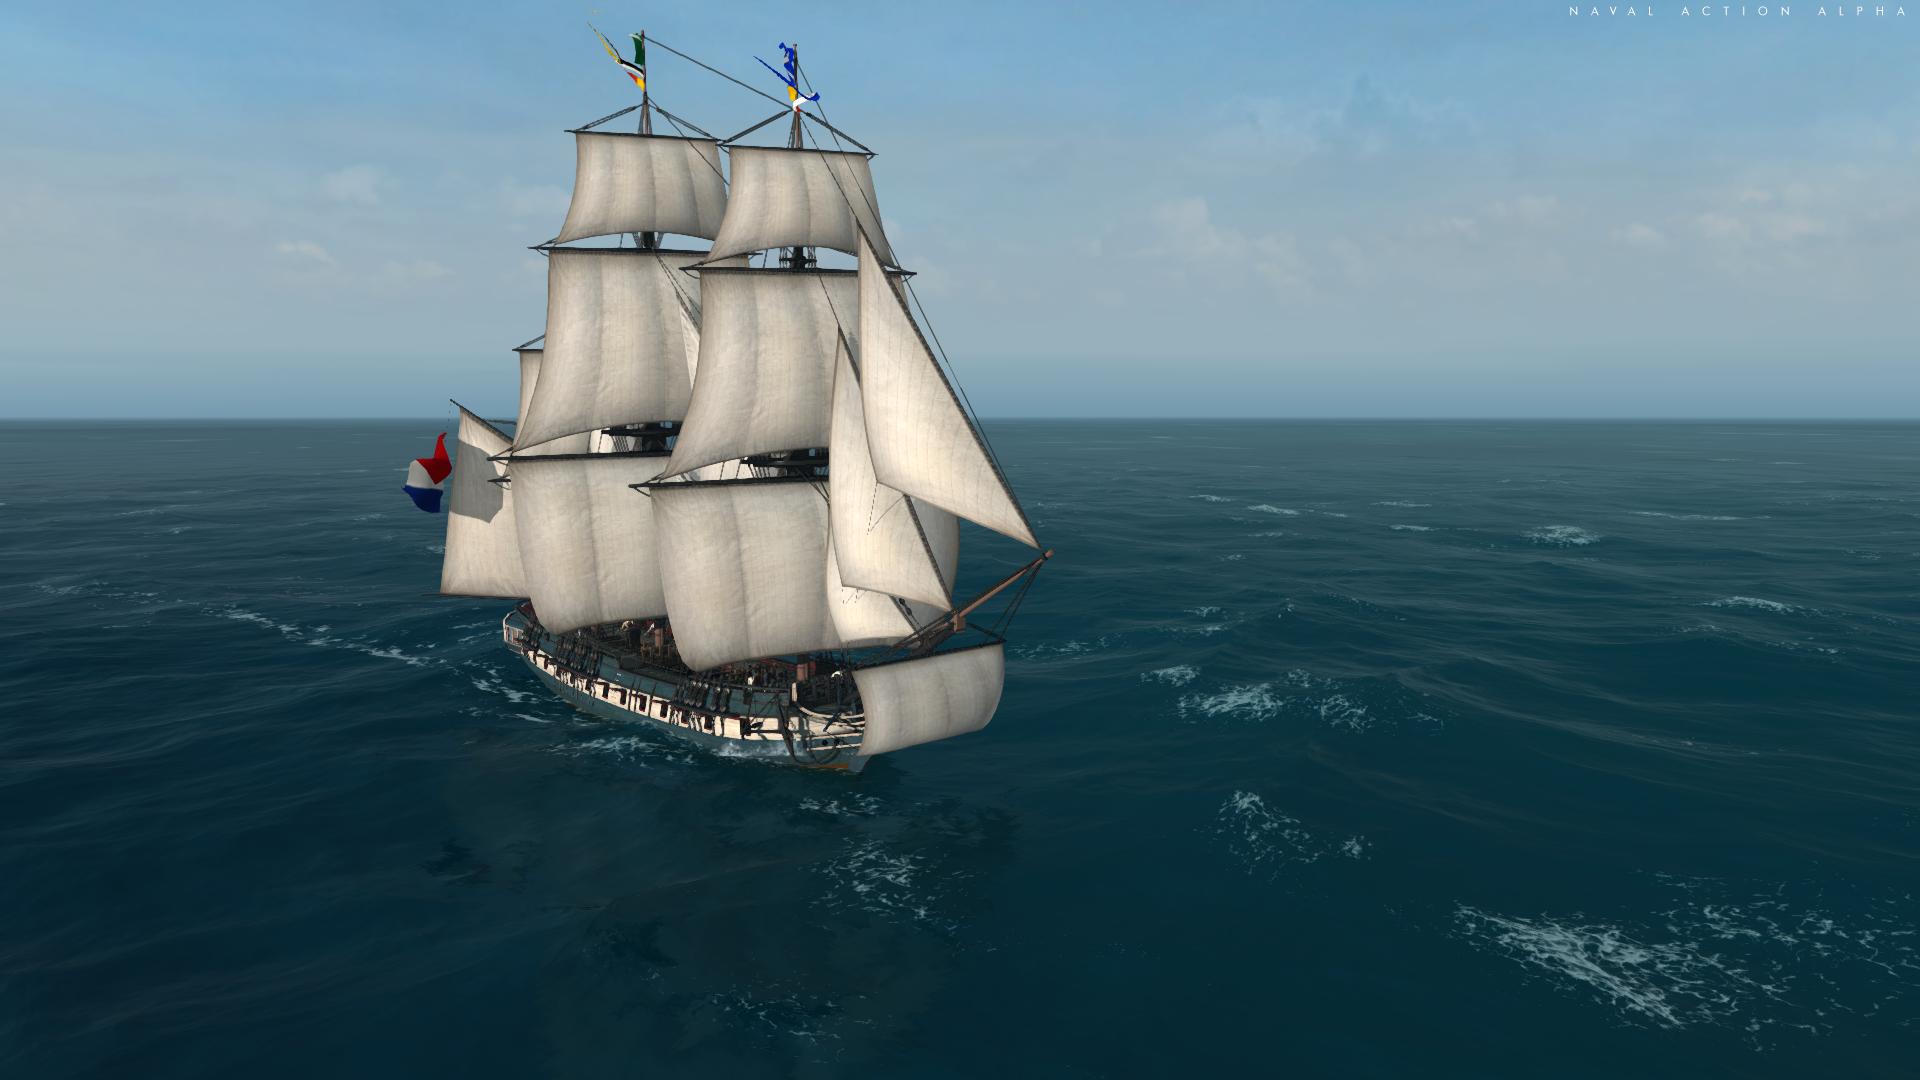 Pirate Frigate Pirate Frigate NavalAction Wikia